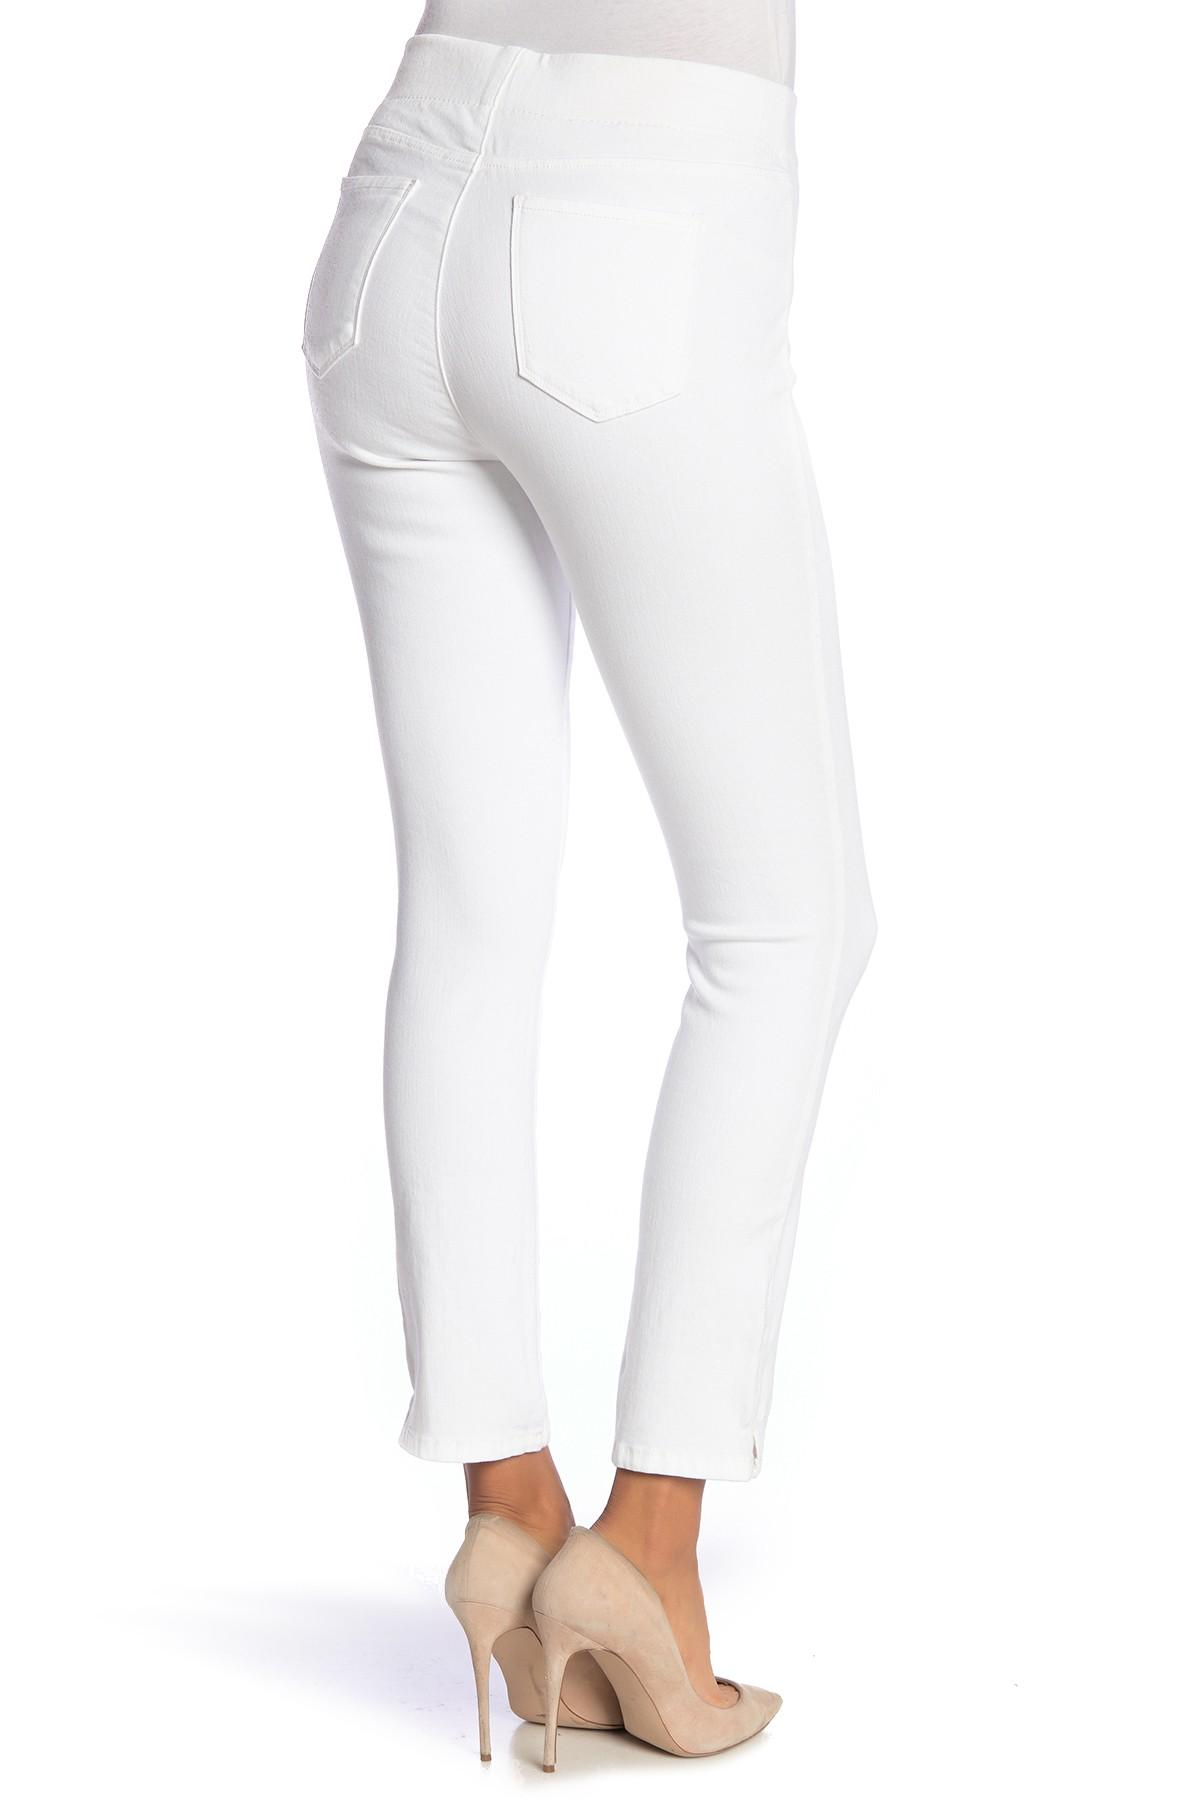 6bf84b8b6dd079 Lyst - Nydj Alina Pull-on Ankle Skinny Jeans (regular & Plus) in White